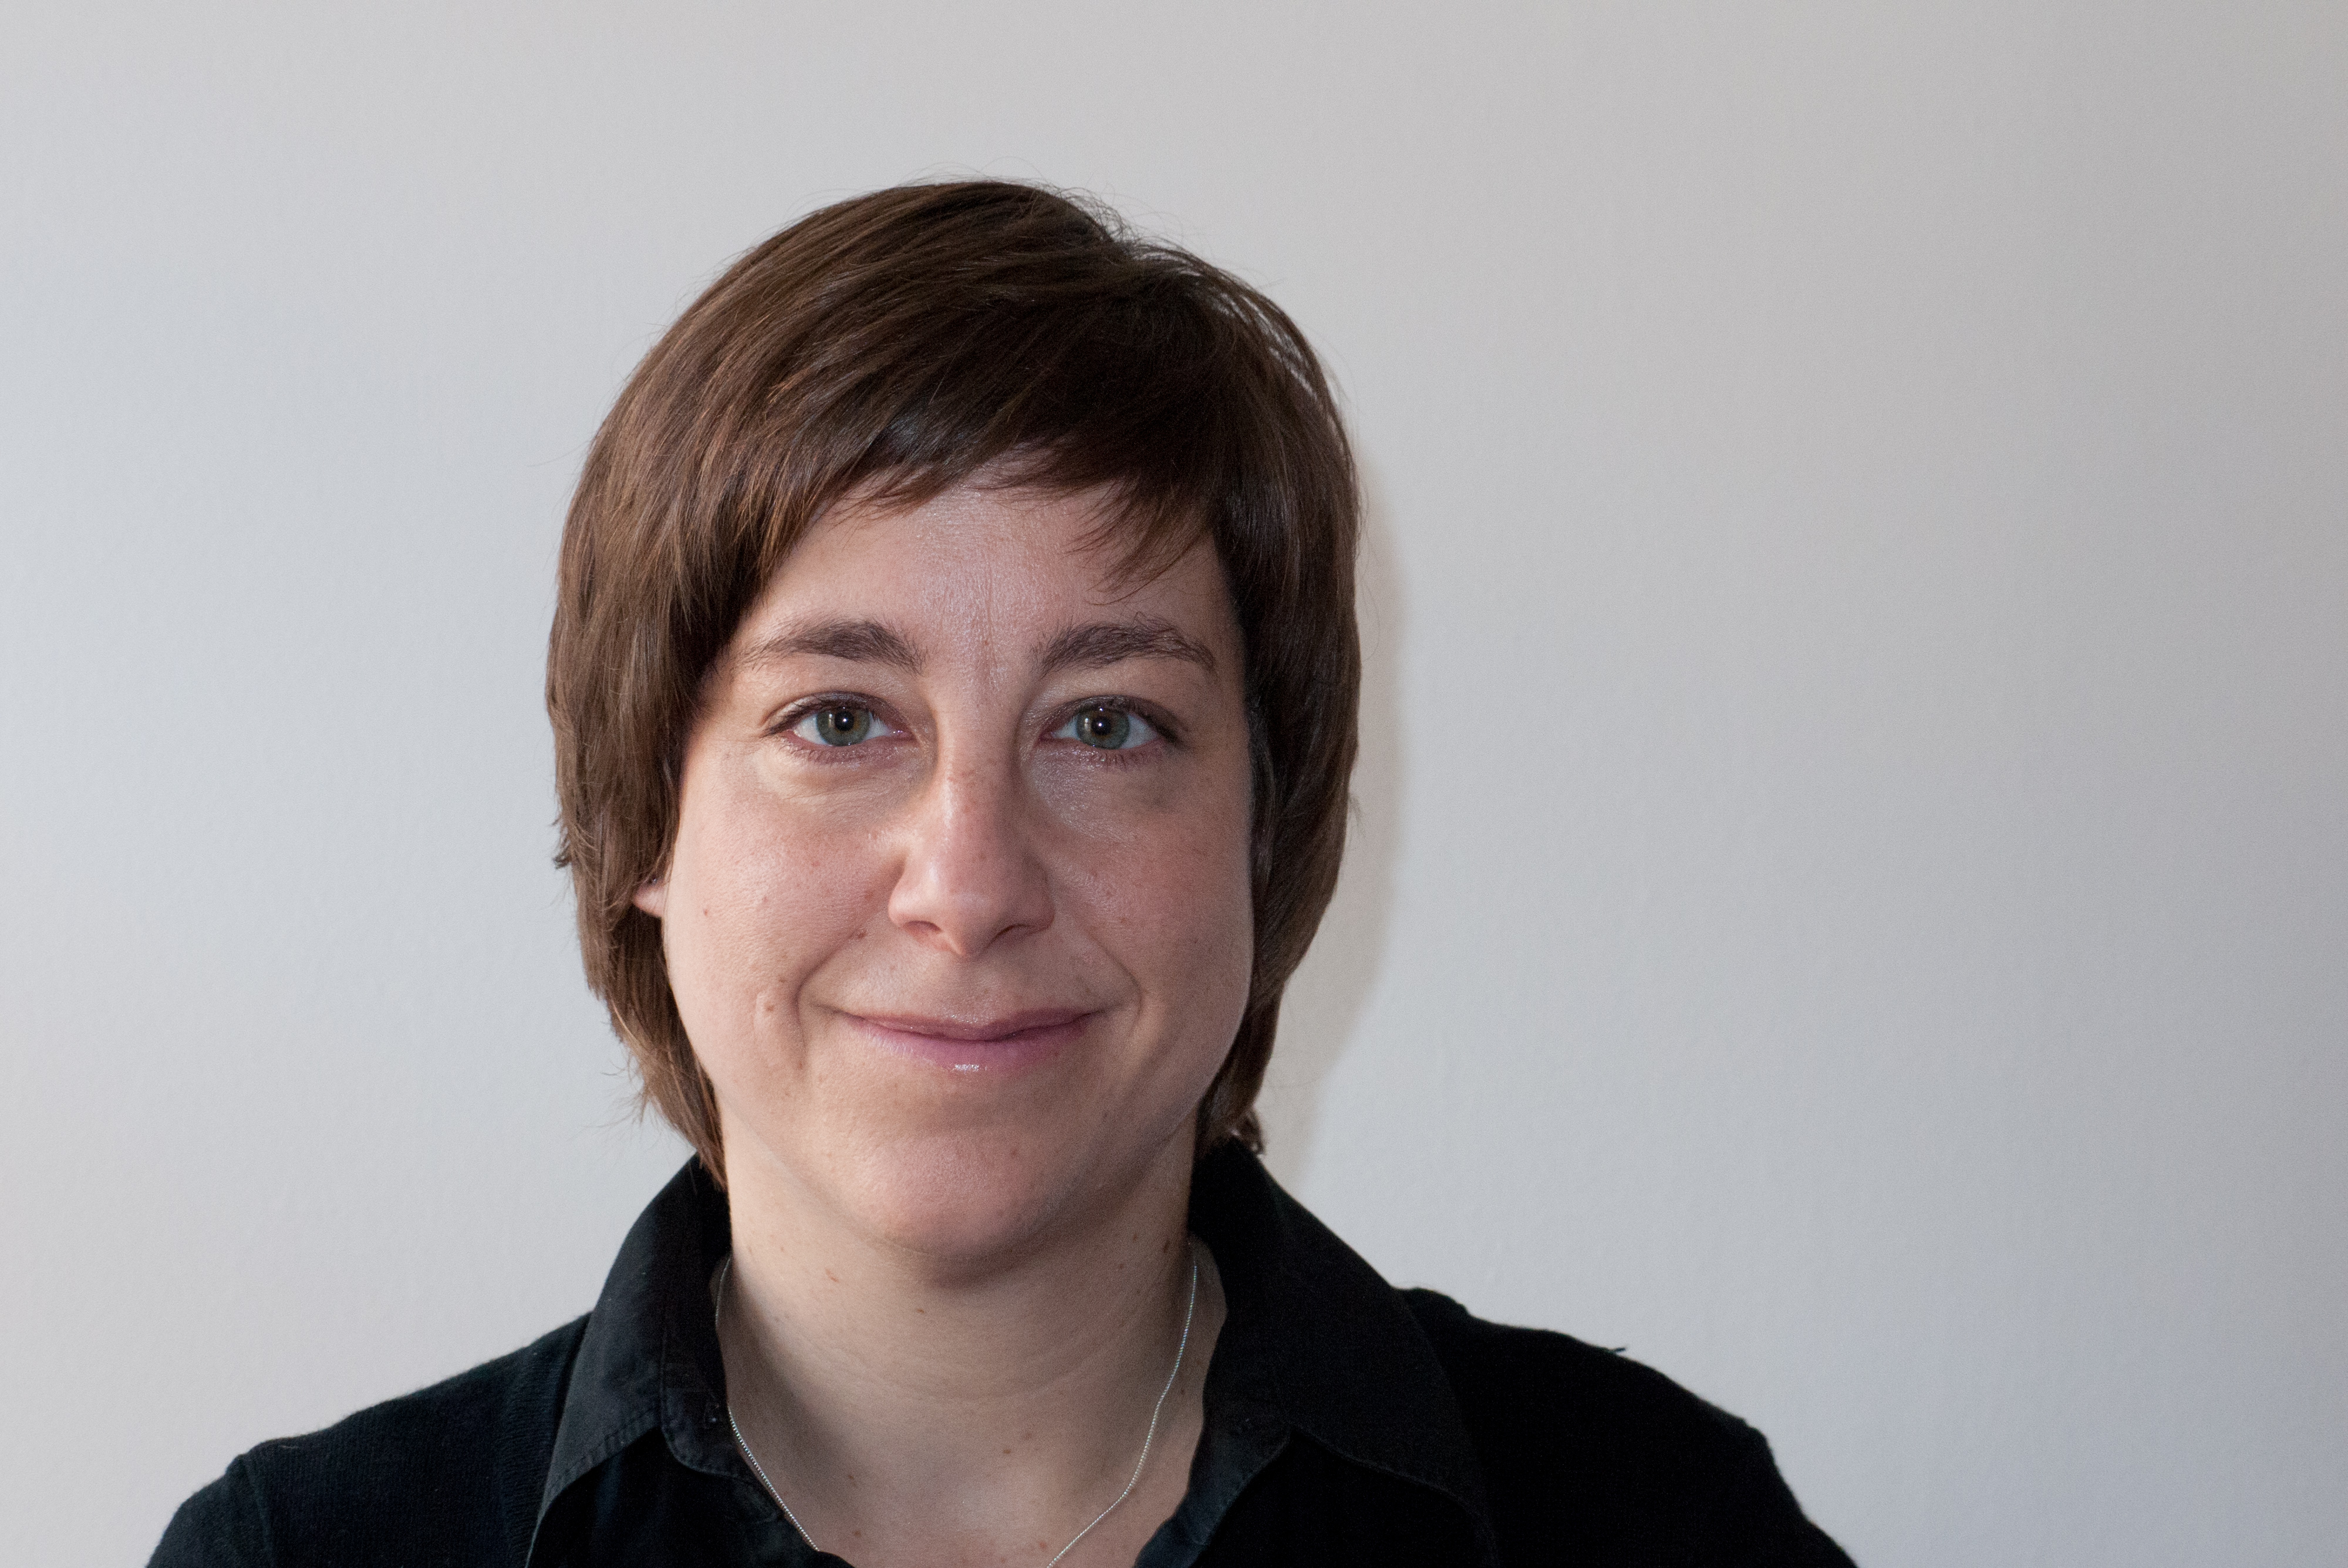 Dr. Anja Dieterich